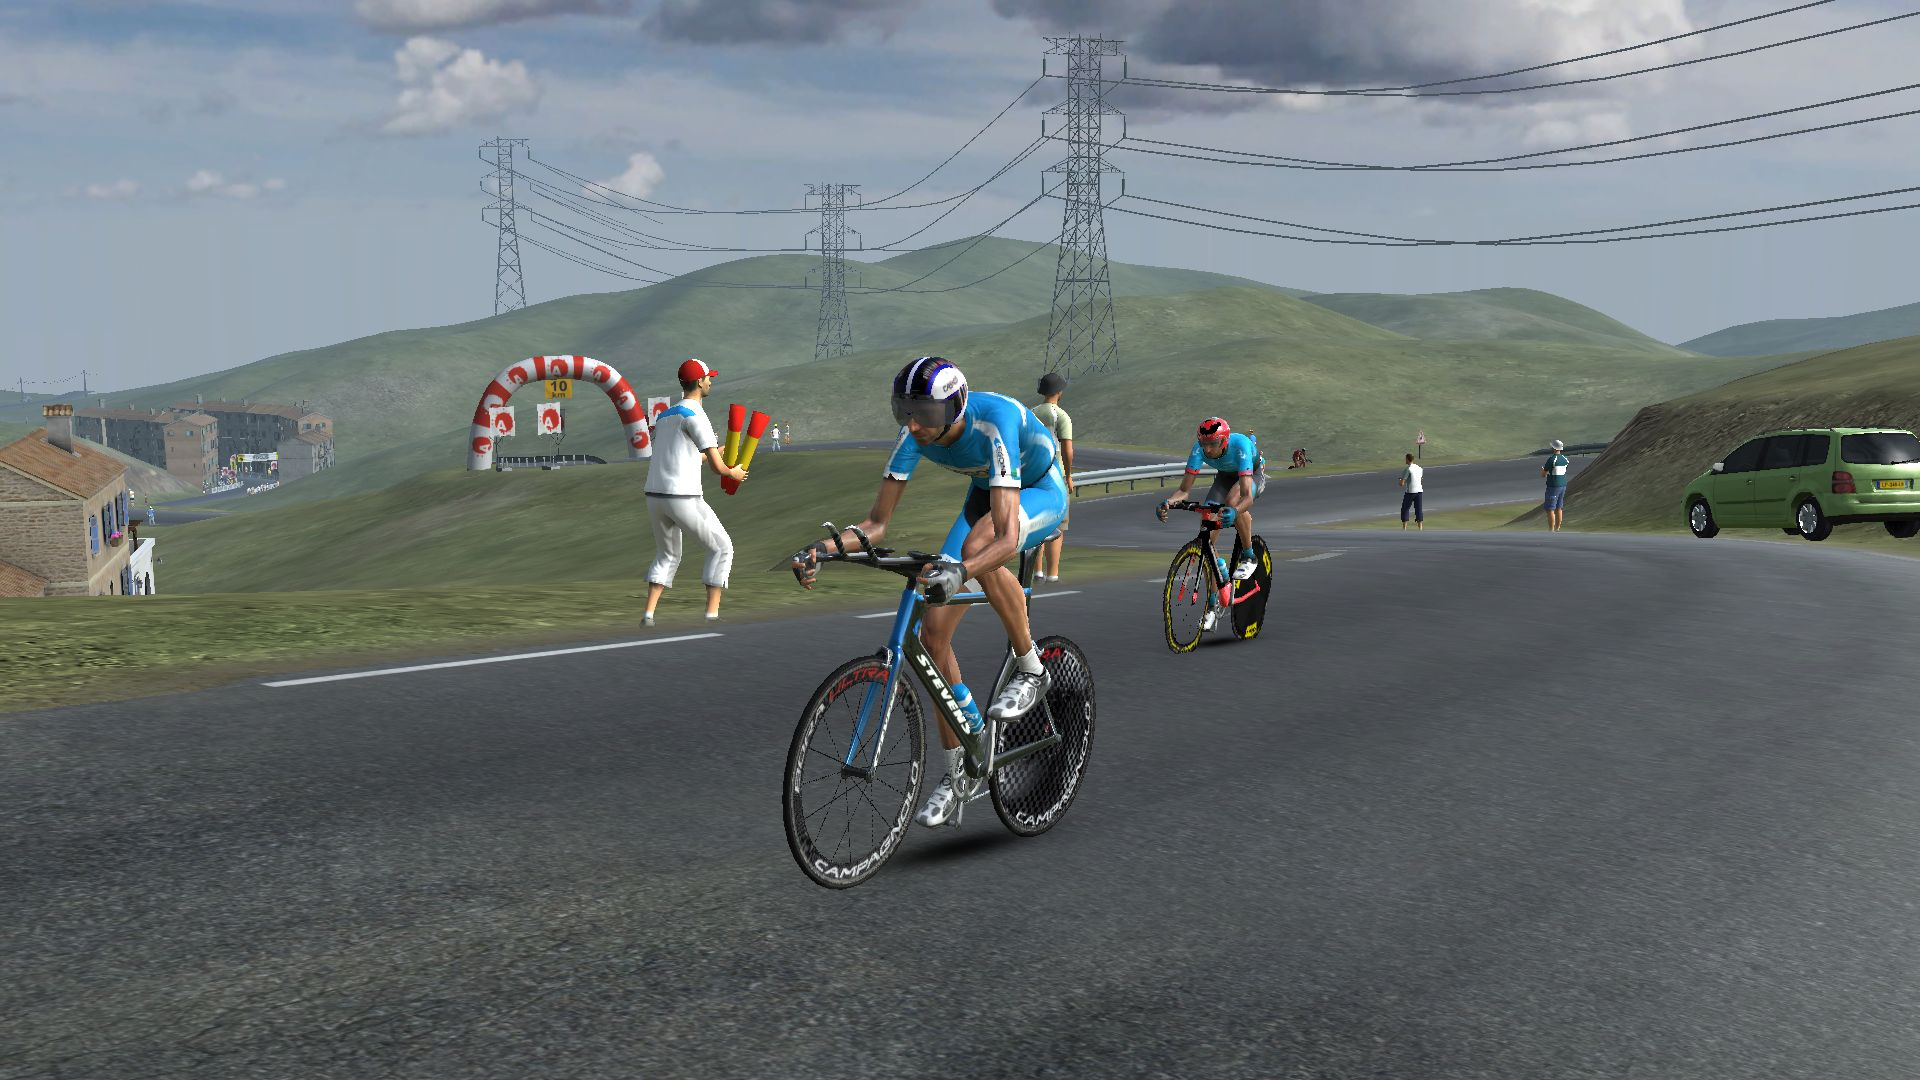 pcmdaily.com/images/mg/2019/Races/GTM/Giro/mg19_giro_09_PCM0025.jpg